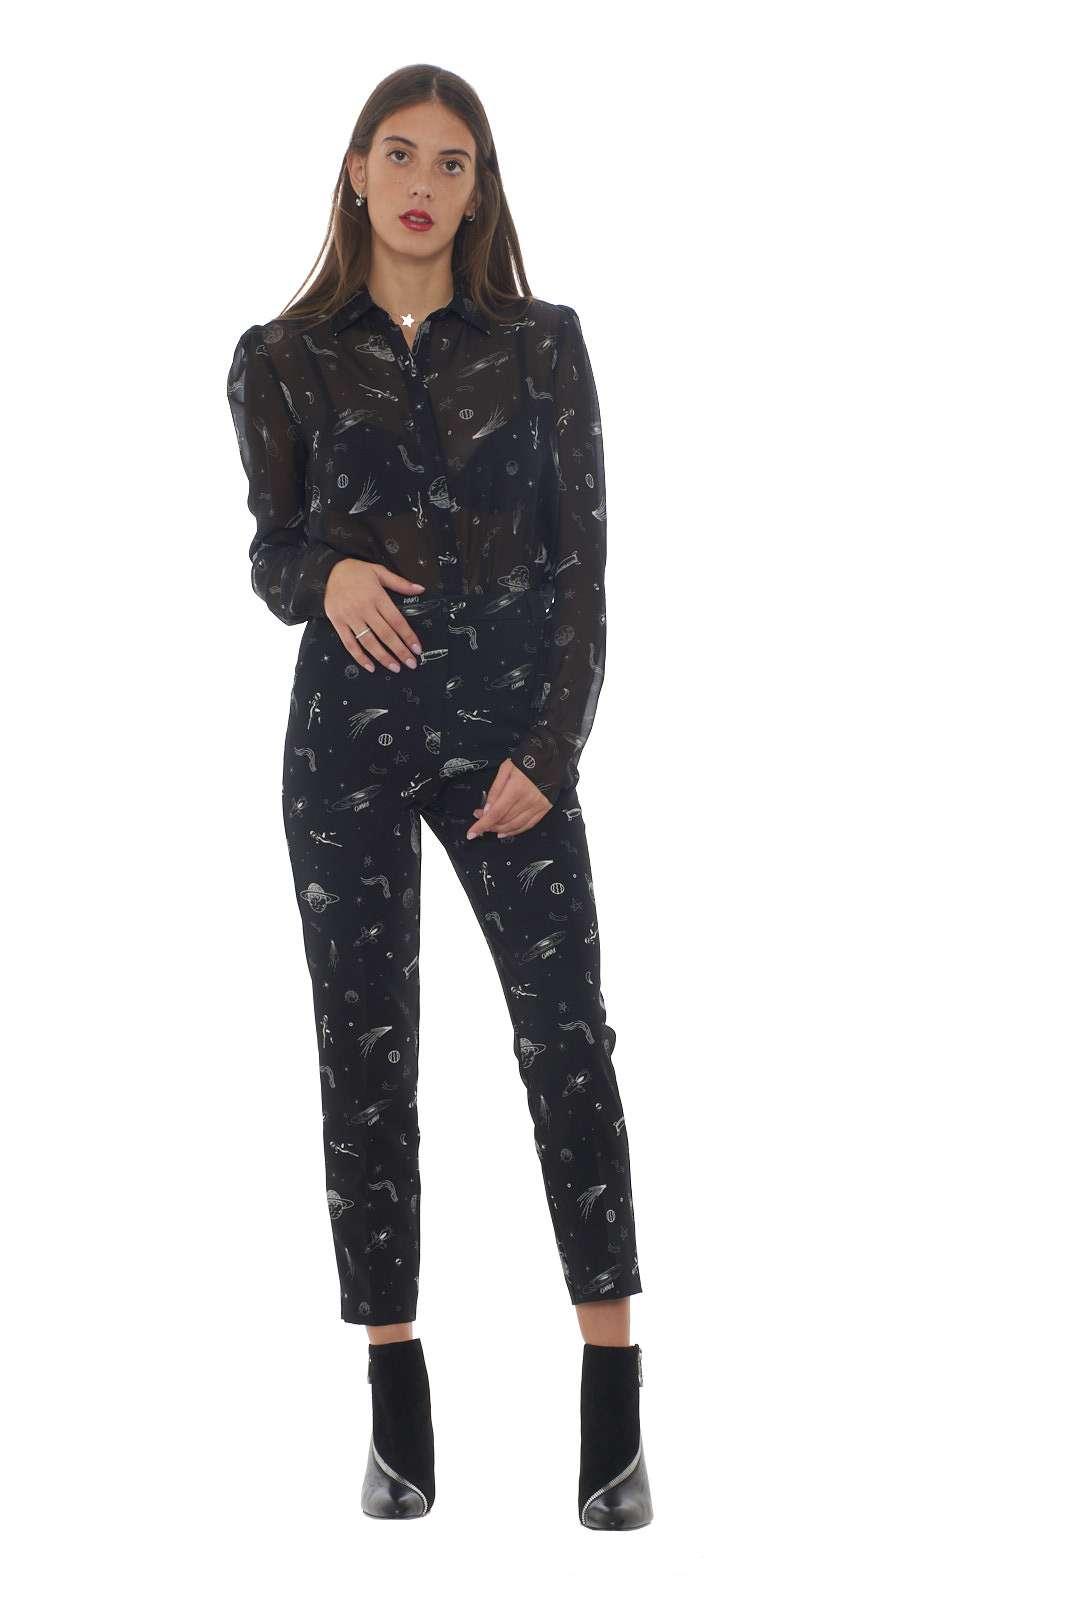 https://www.parmax.com/media/catalog/product/a/i/AI-outlet_parmax-camicia-donna-Pinko-1B145W-D.jpg